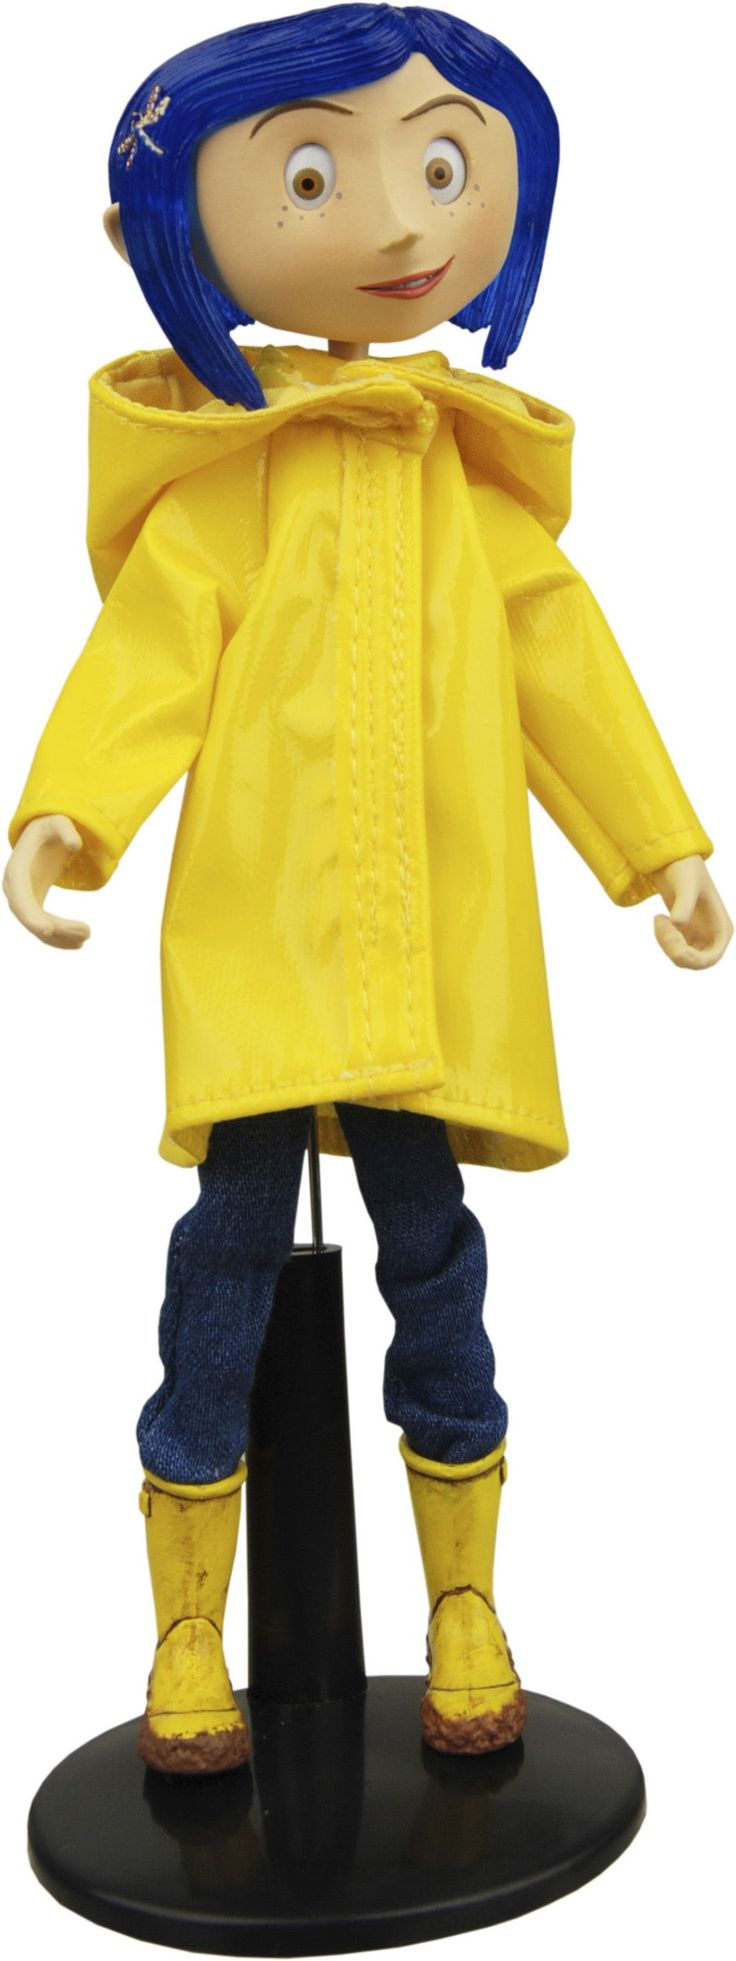 Coraline Bendy Doll in Rain Coat Bendy doll, Coraline, Dolls